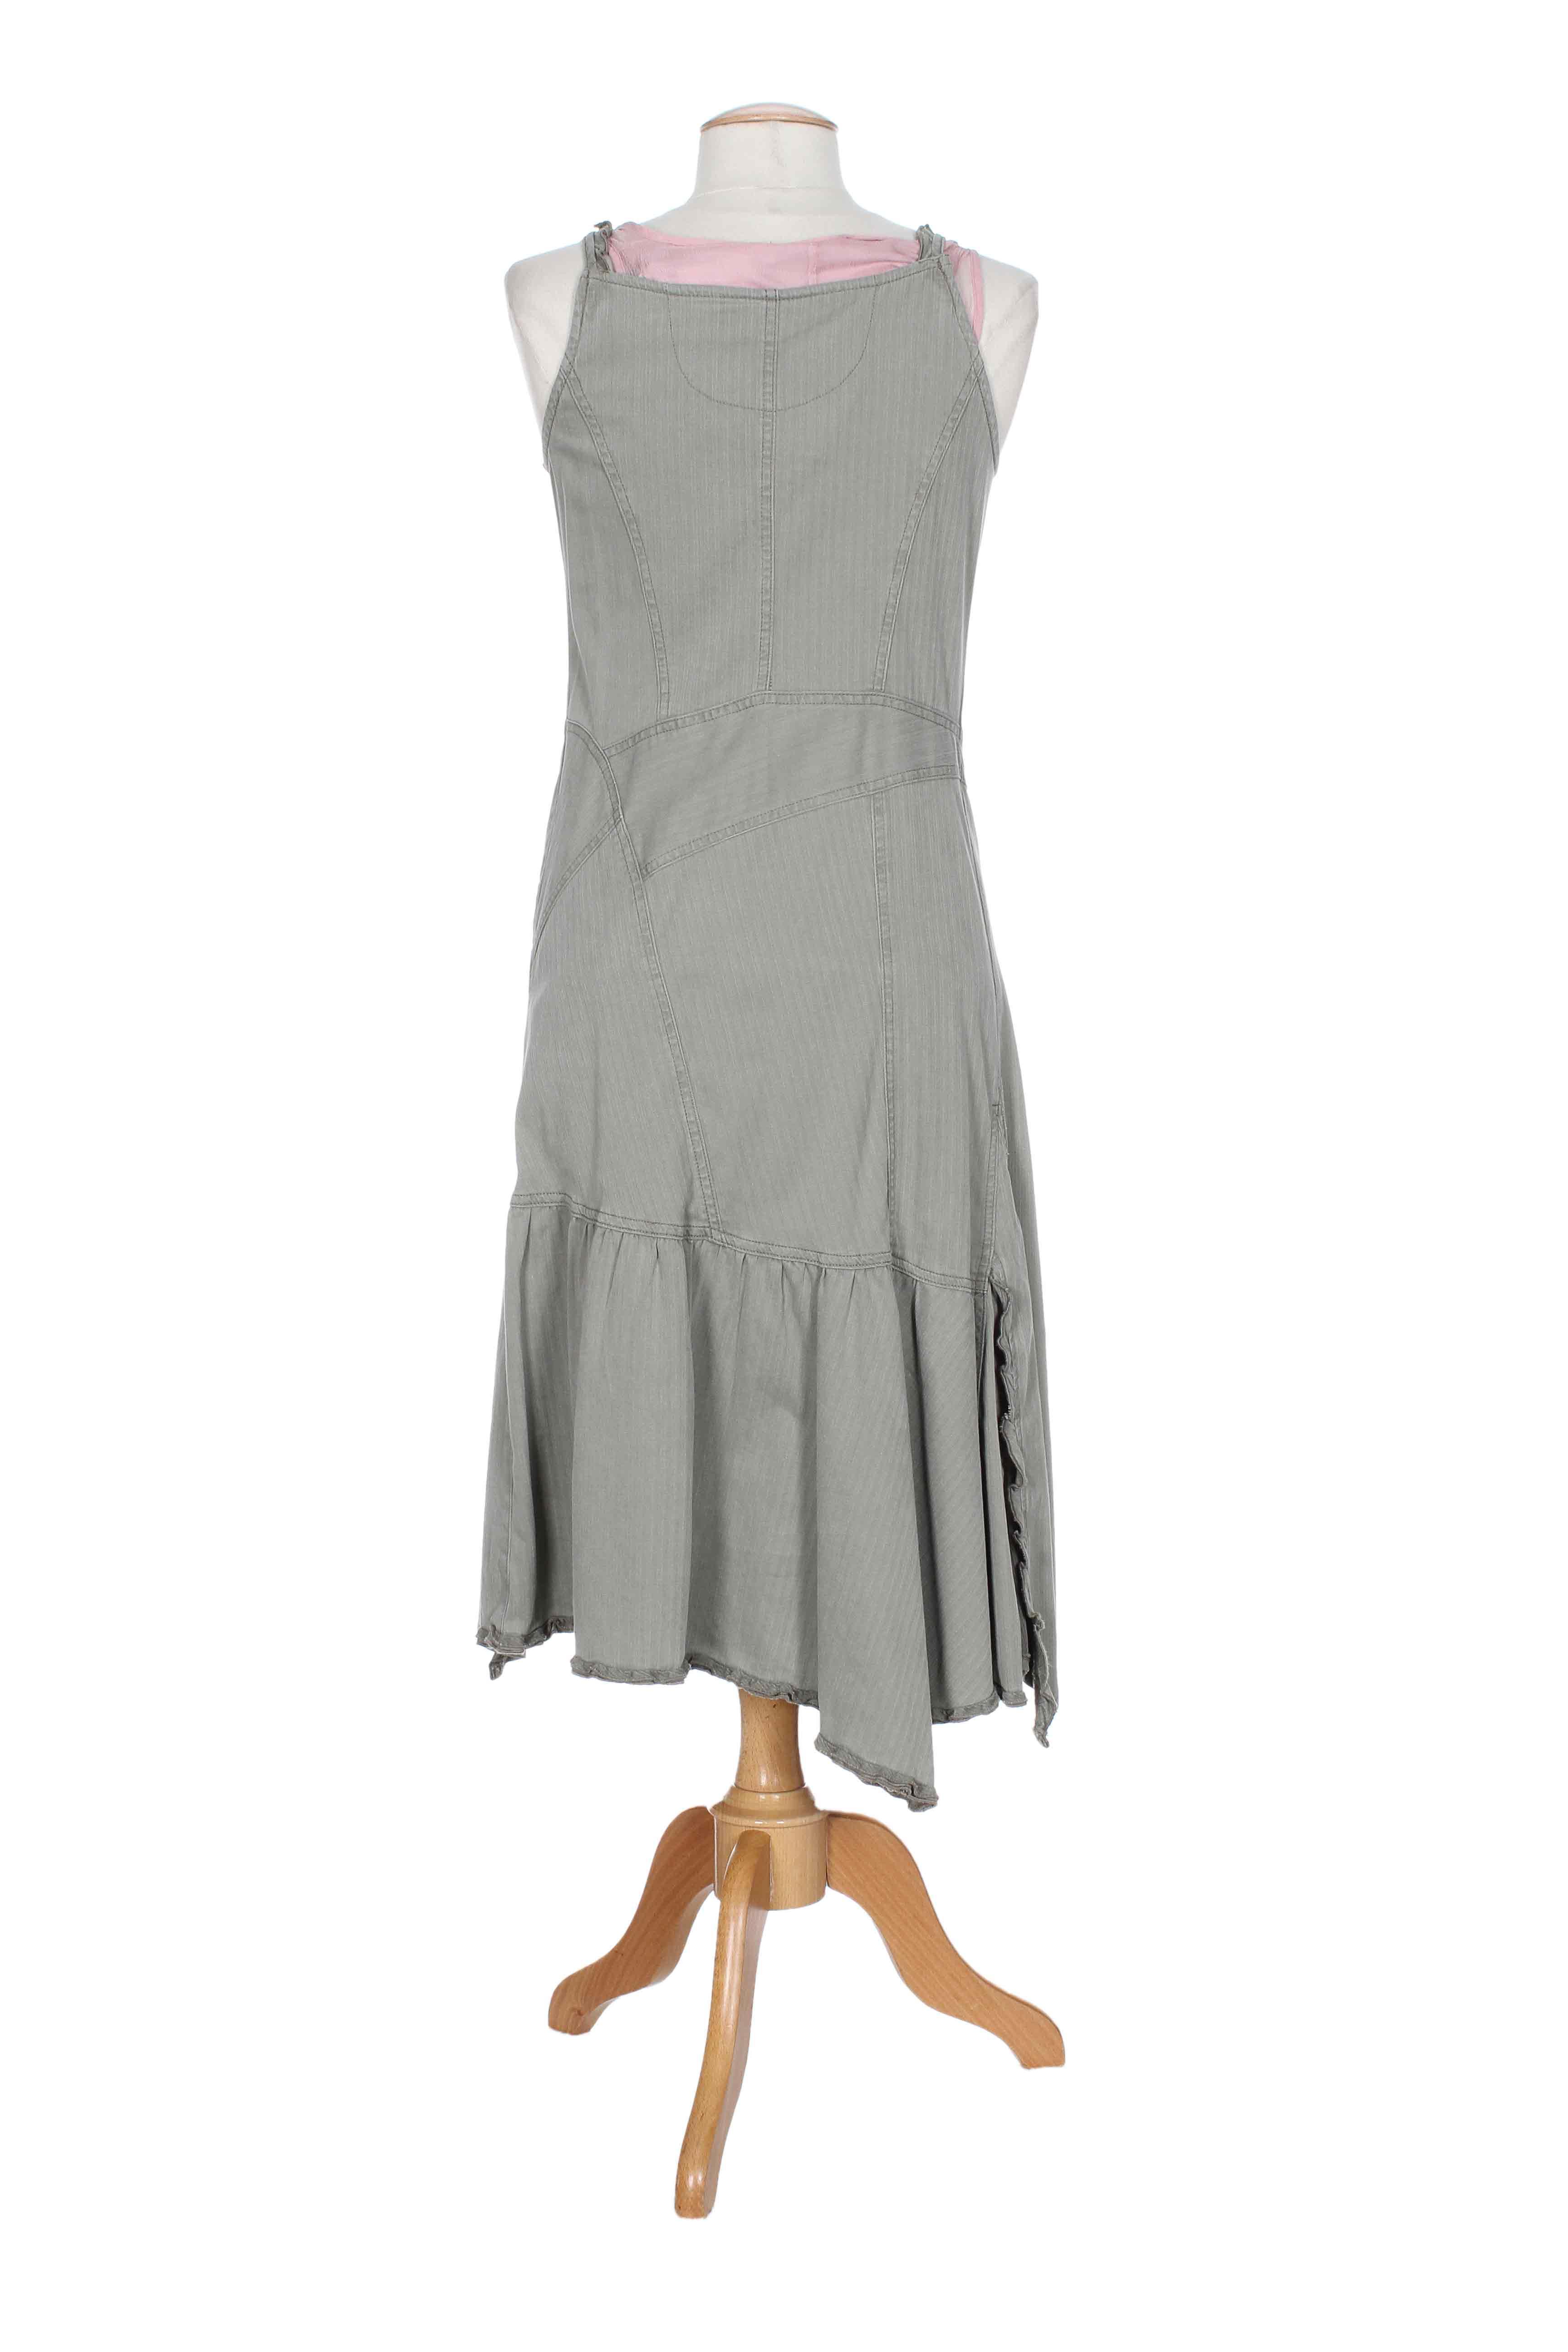 lauren vidal robes longues femme de couleur gris en soldes. Black Bedroom Furniture Sets. Home Design Ideas